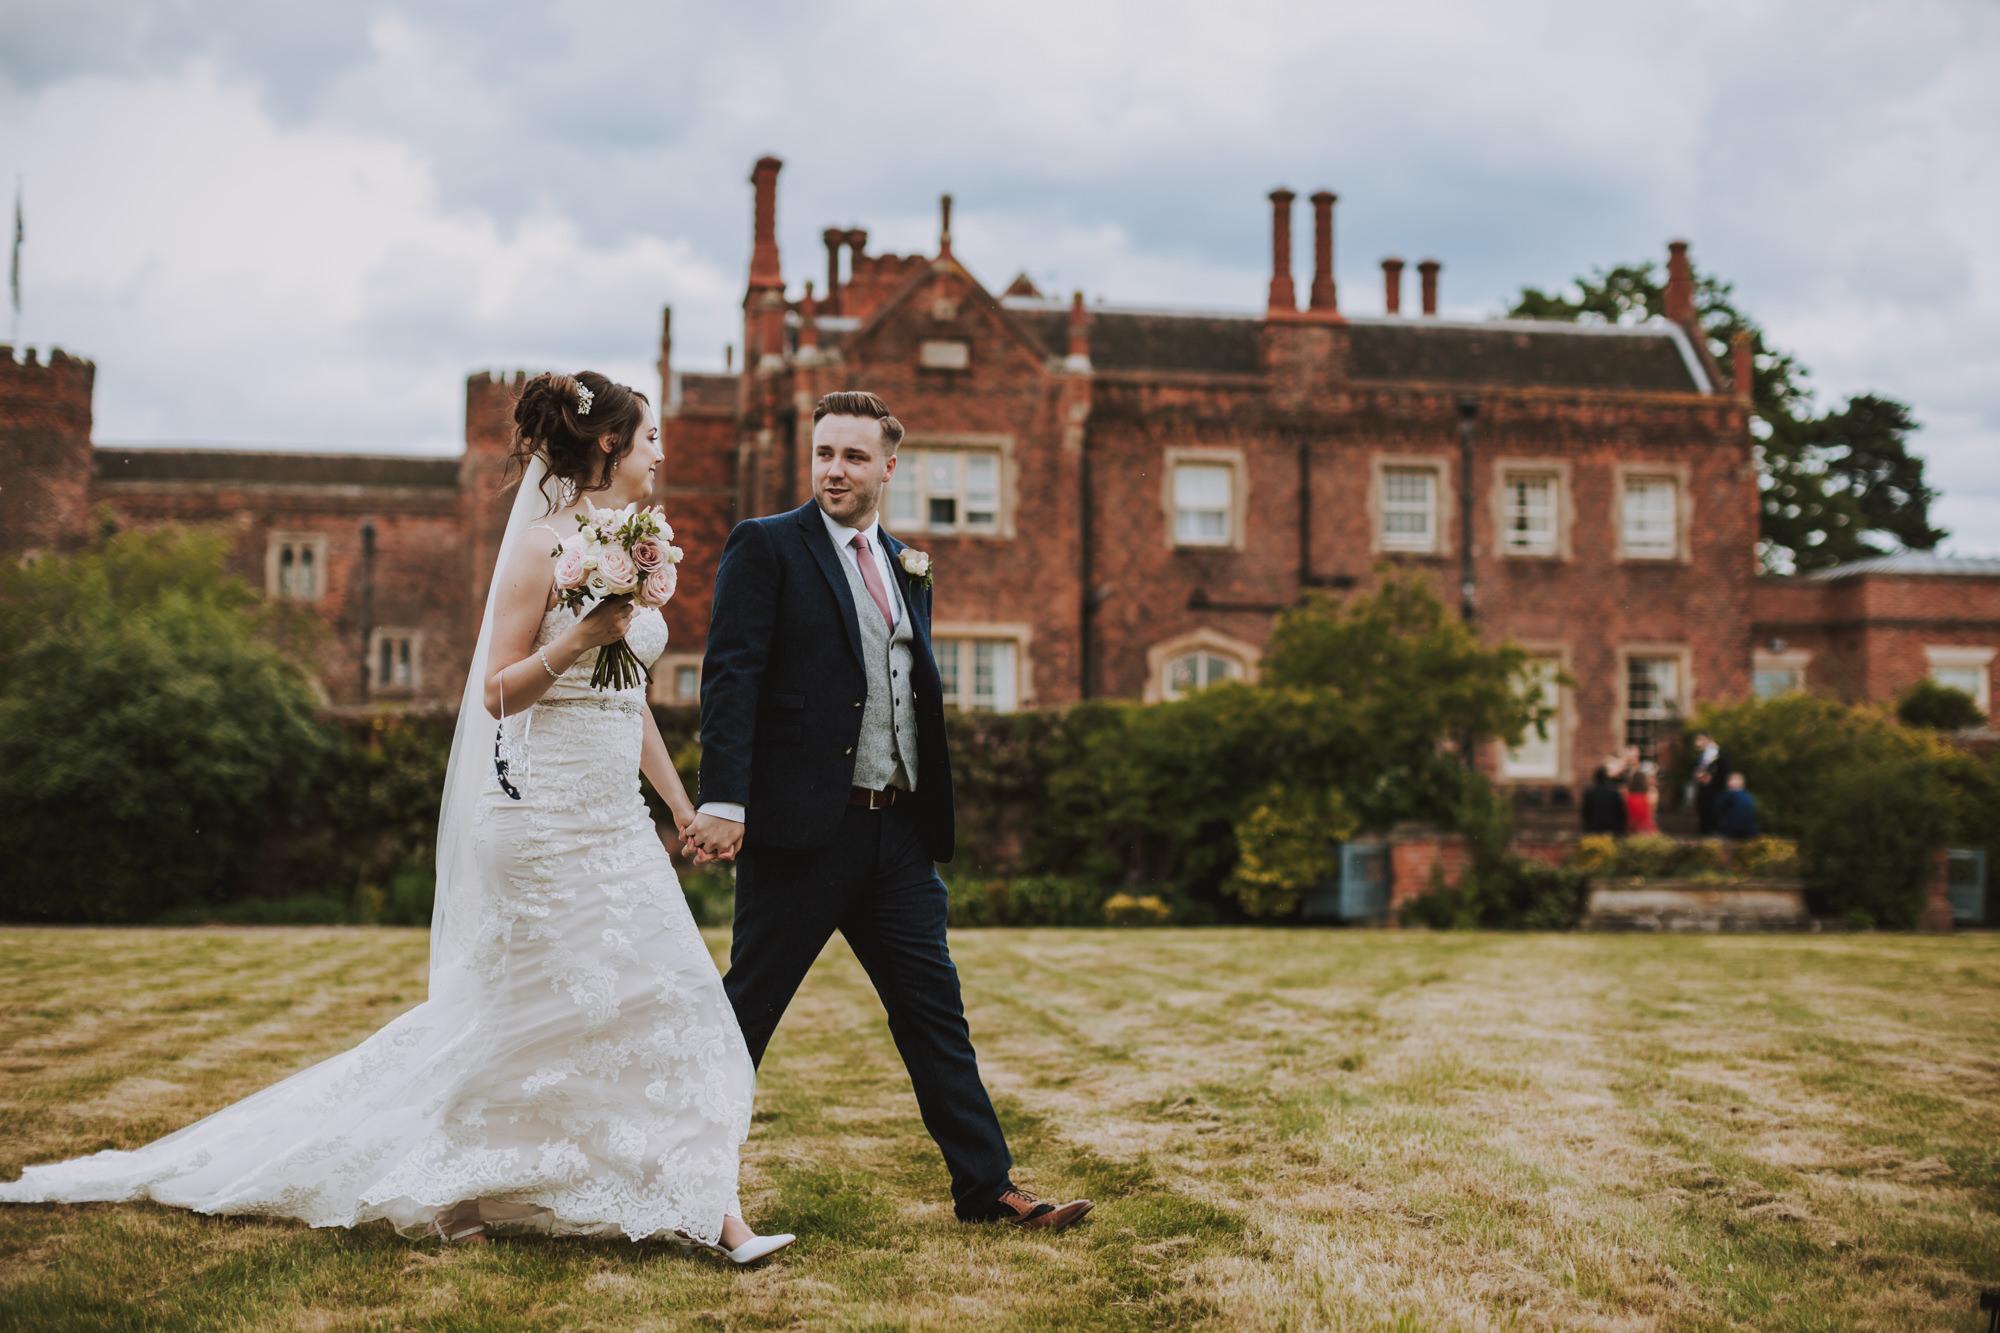 hodsock priory wedding photographers blog57.jpg